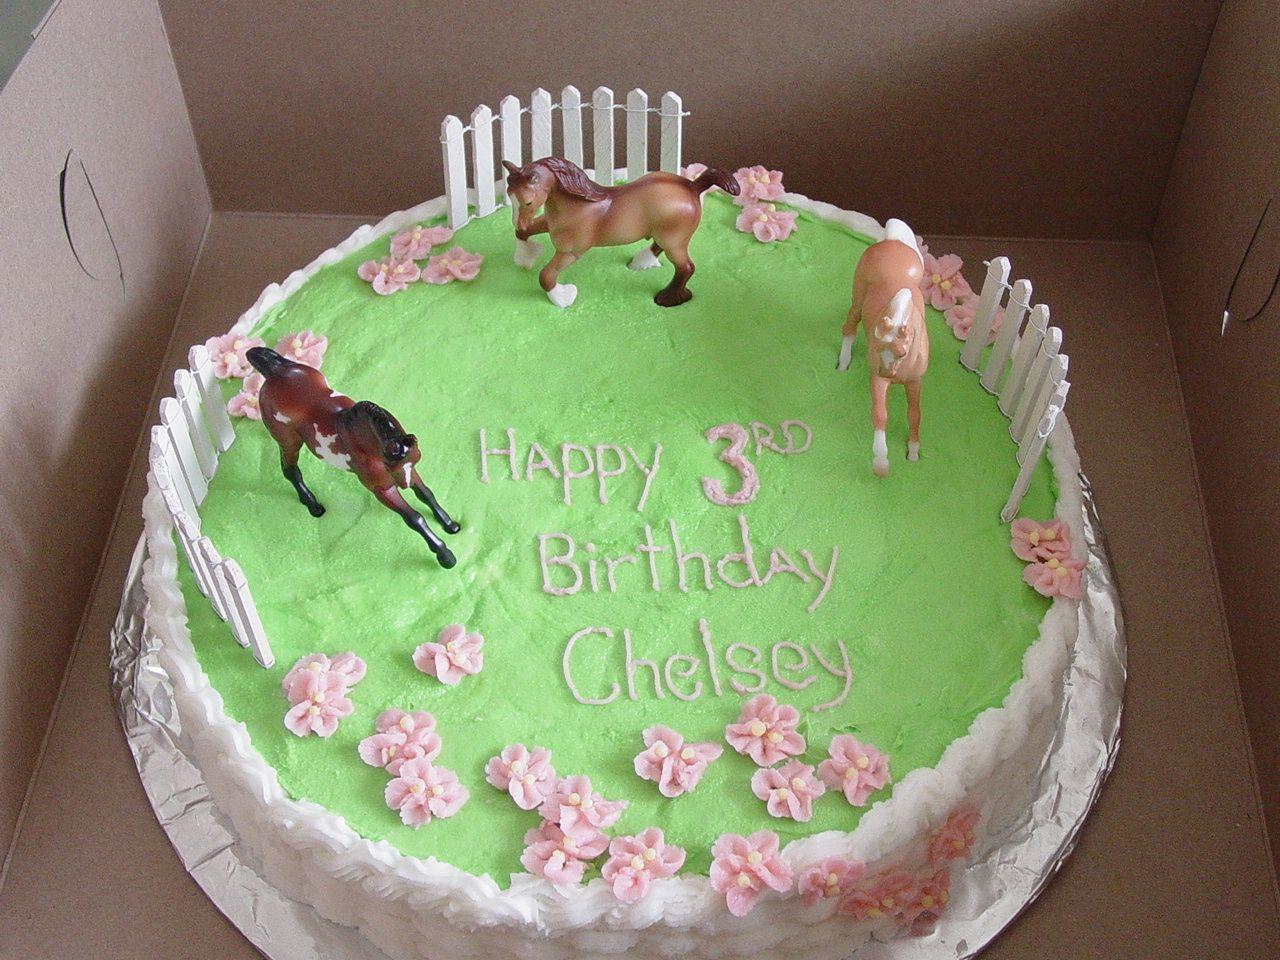 Birthday Cake Decorations Horses : horse birthday cake Horse Pasture Birthday   Children s ...